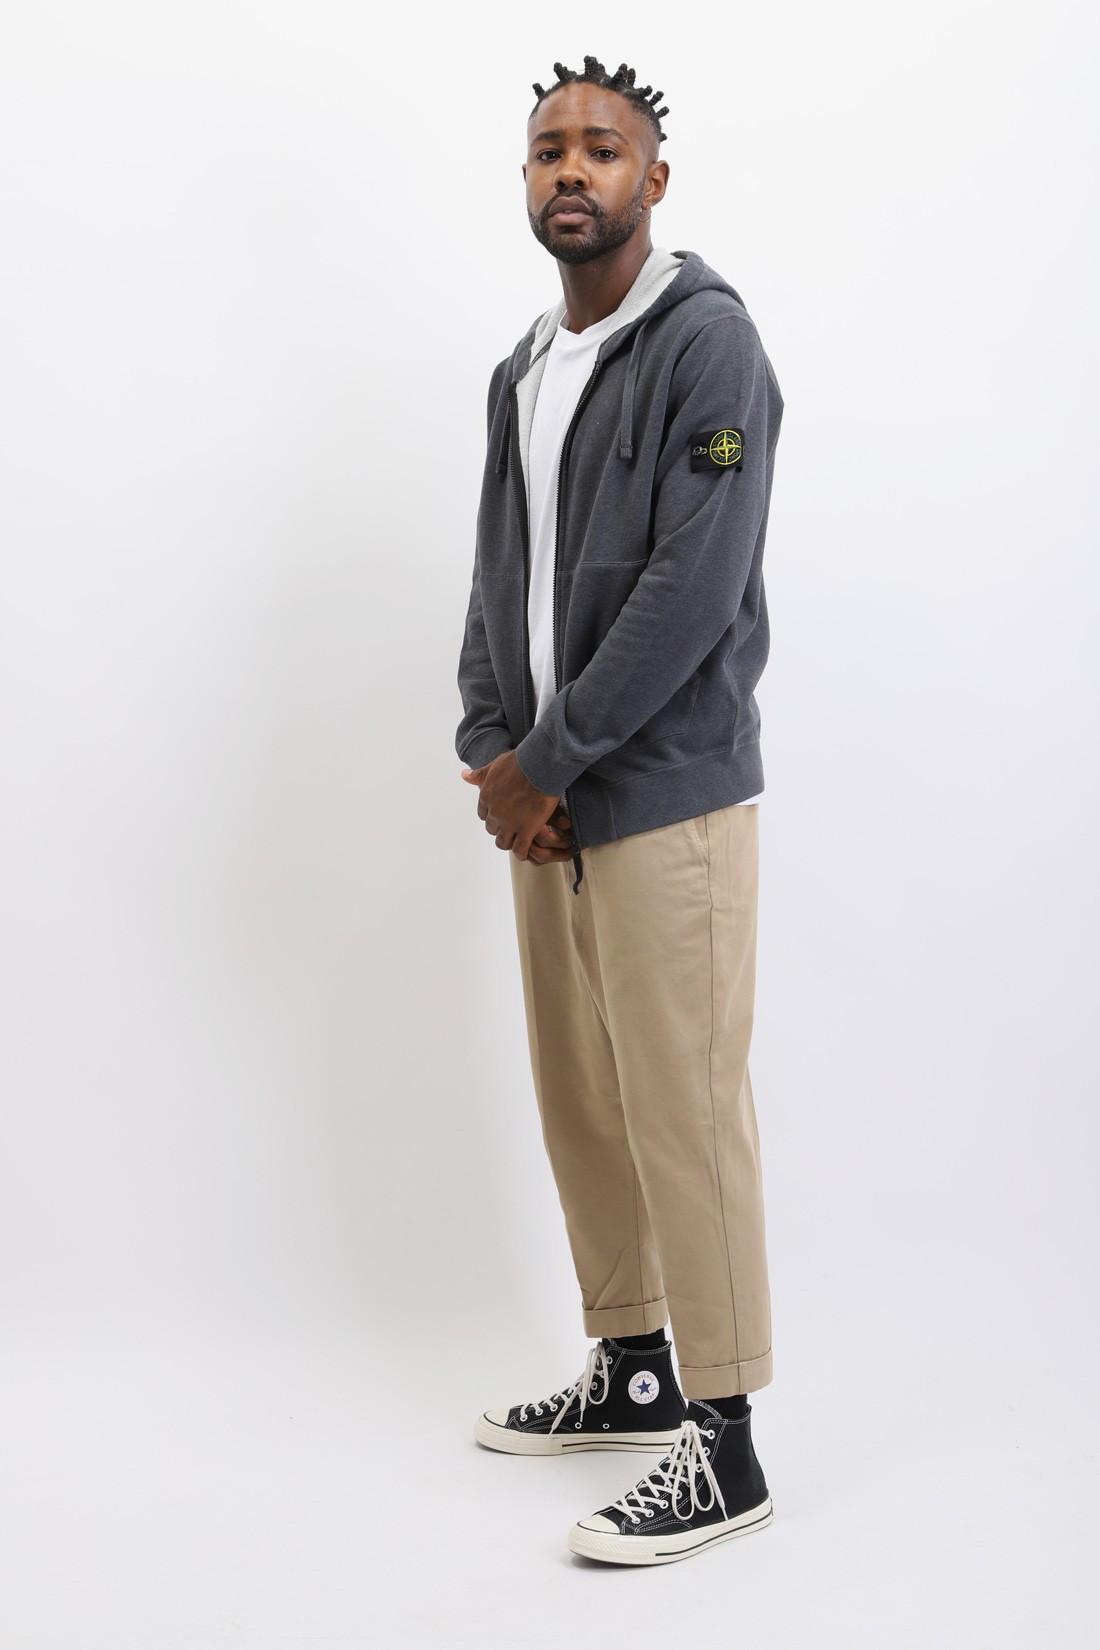 STONE ISLAND / 64220 hooded zip sweater v0m67 Fumo melange